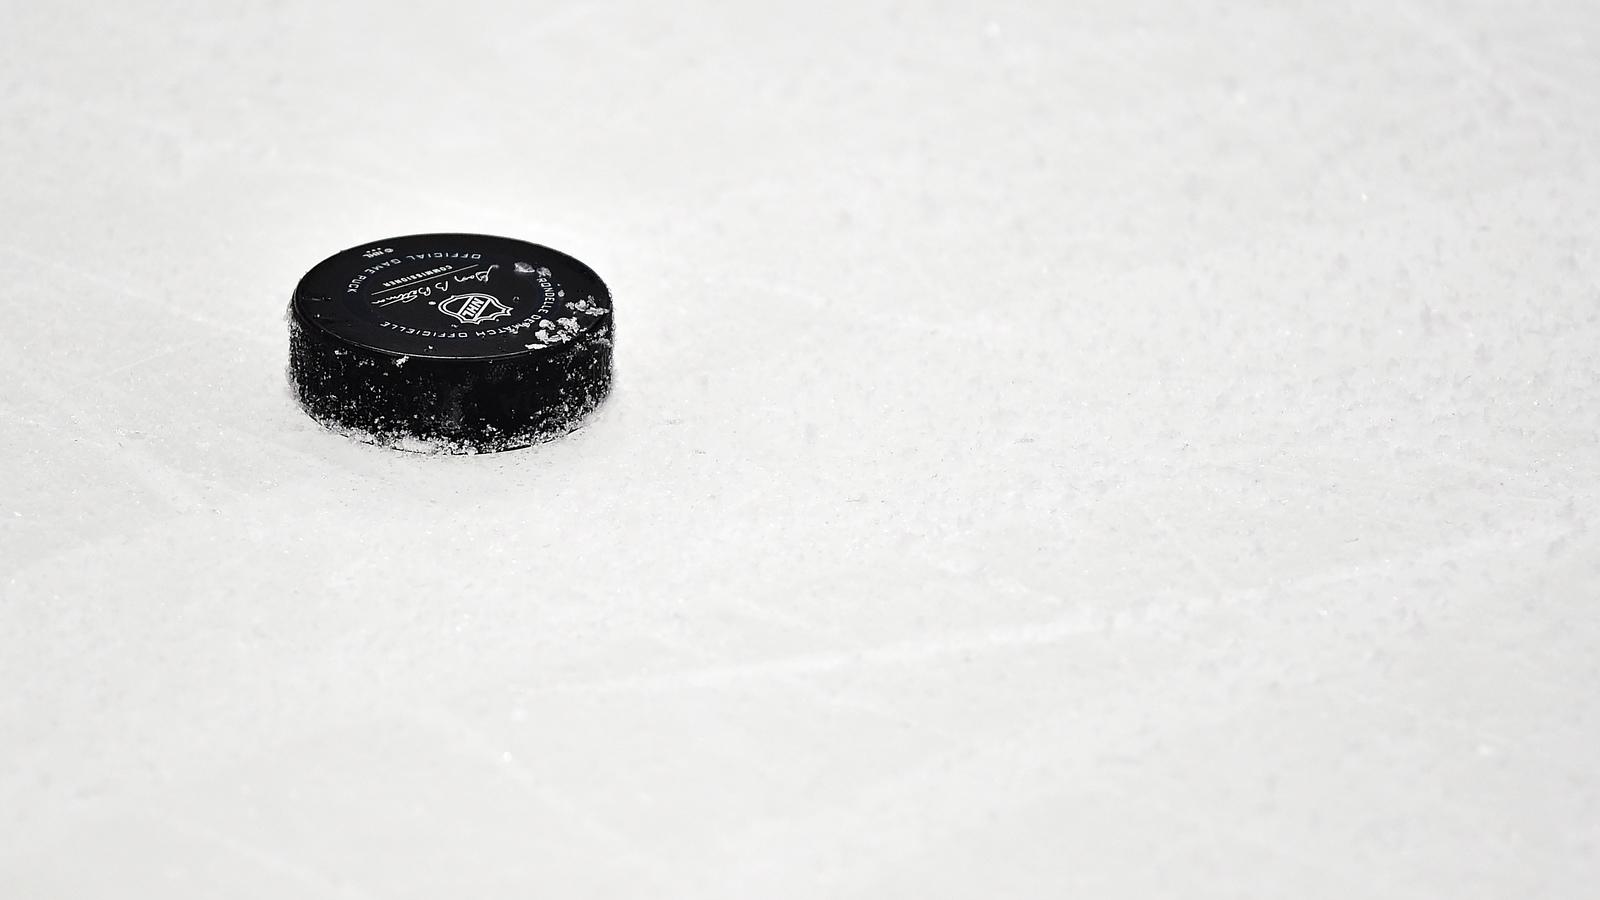 NHL players leery of new postseason format